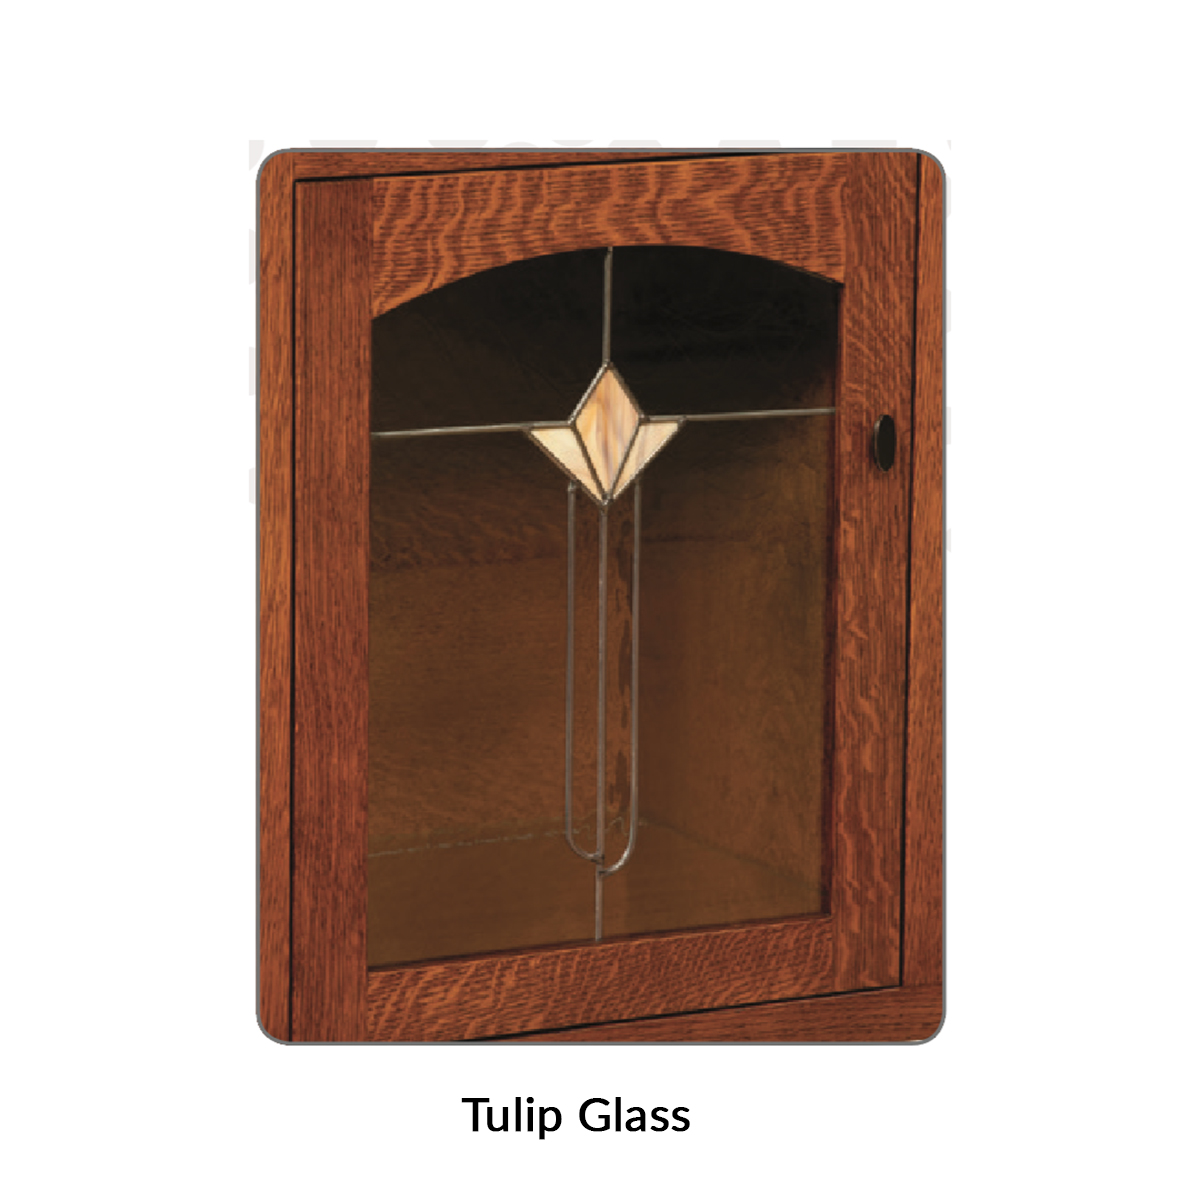 12-tf-tulip-glass.jpg